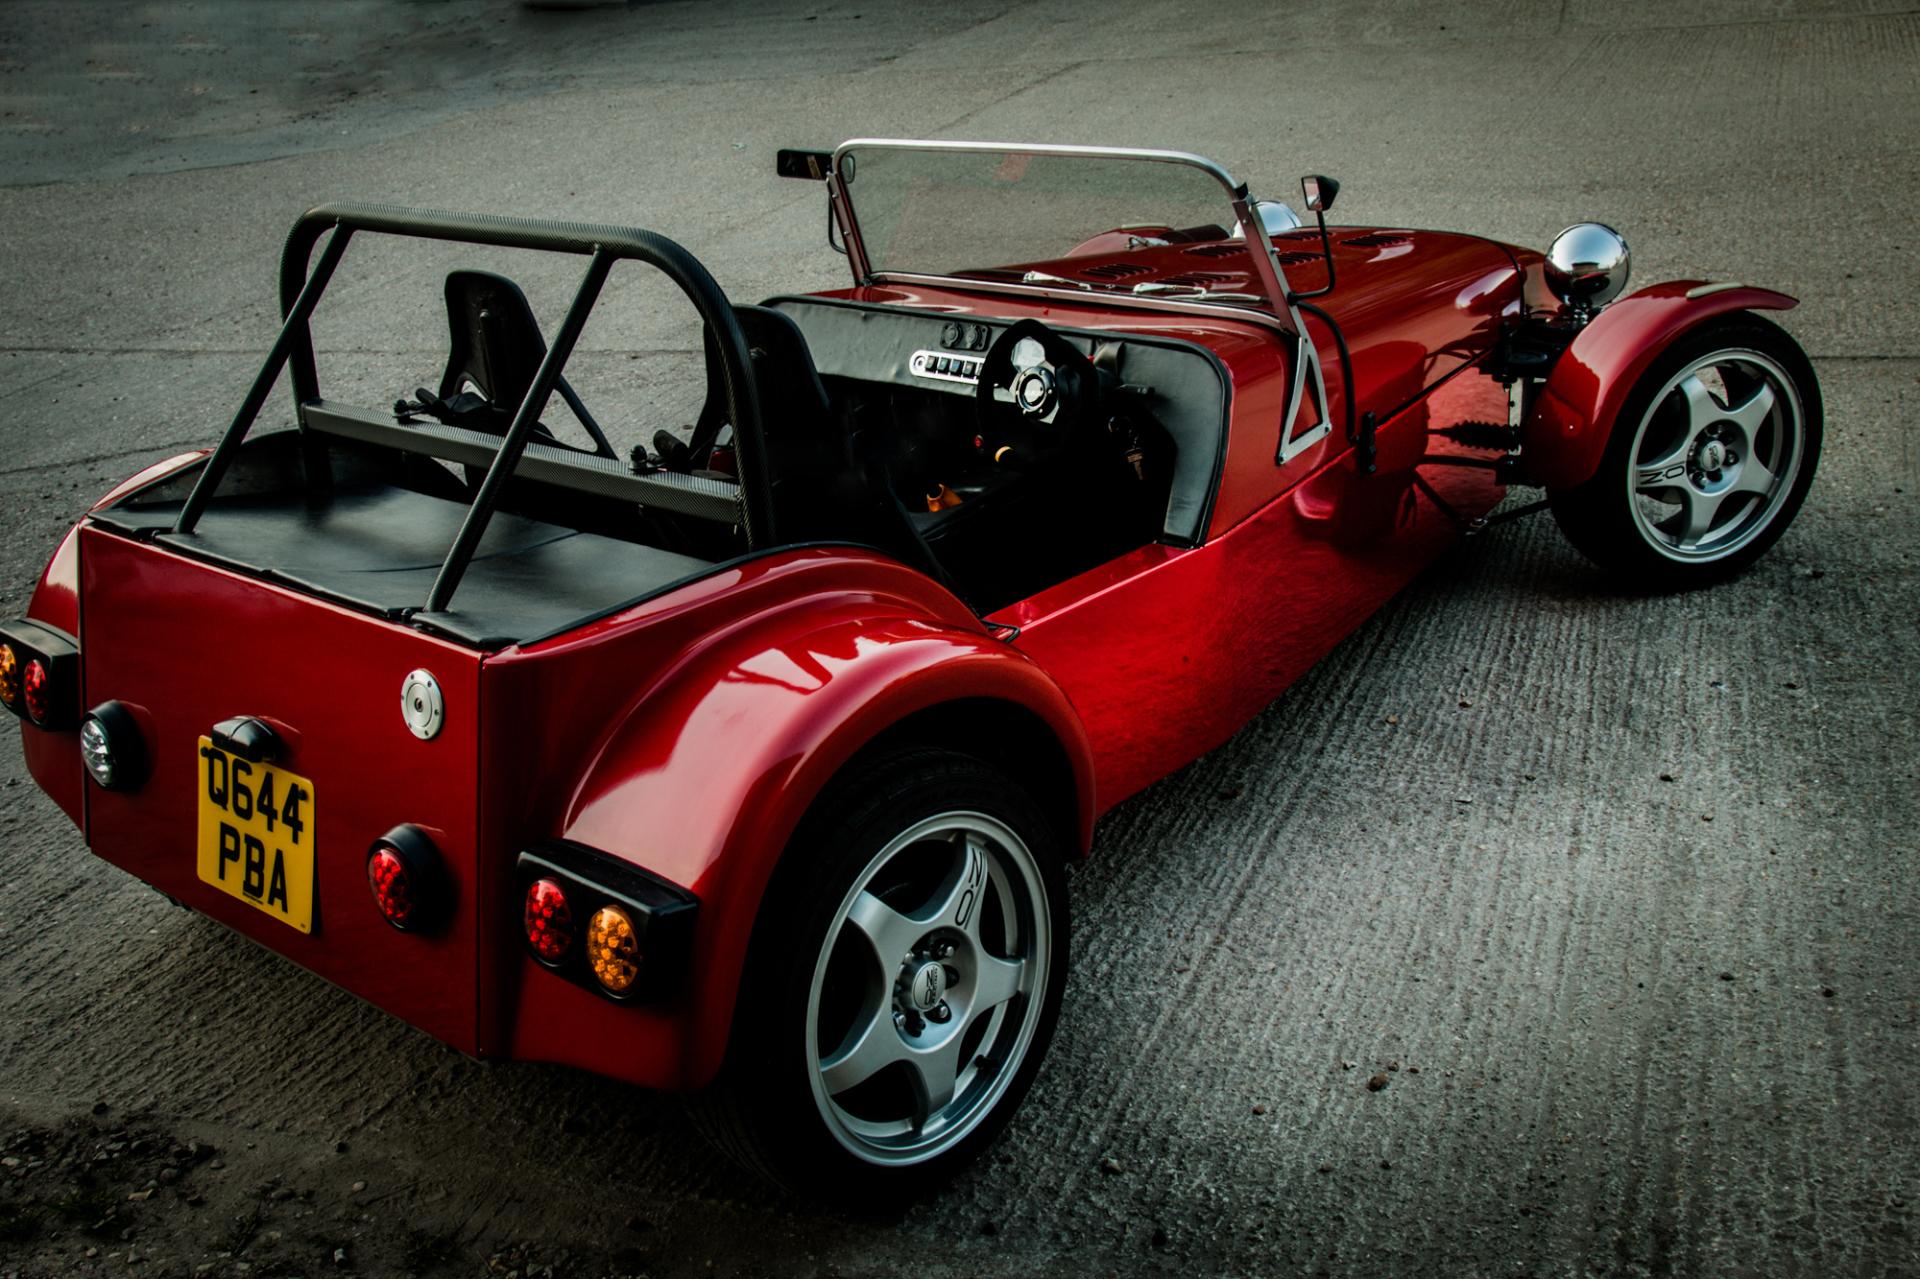 Westfield Kit Car wrap